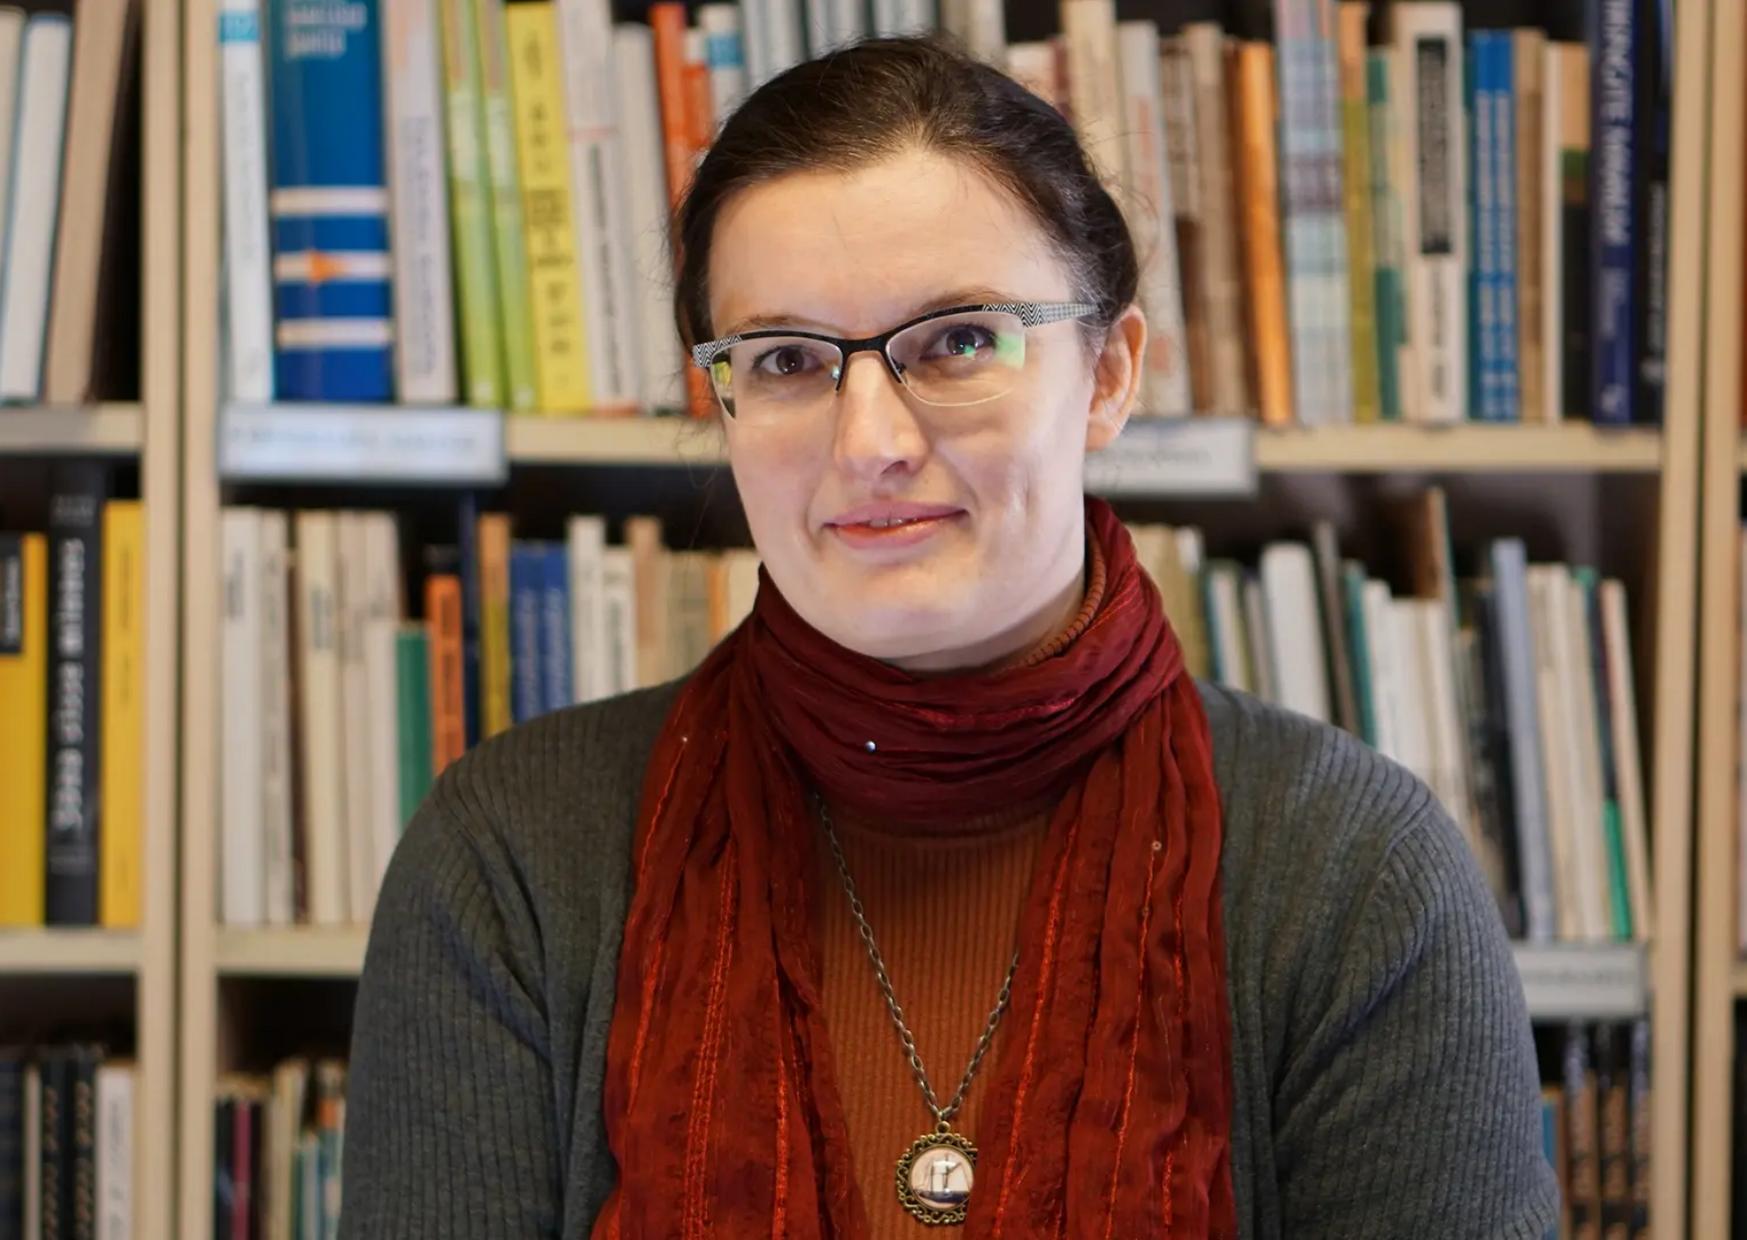 Palju õnne, doktor Katrin Soika!